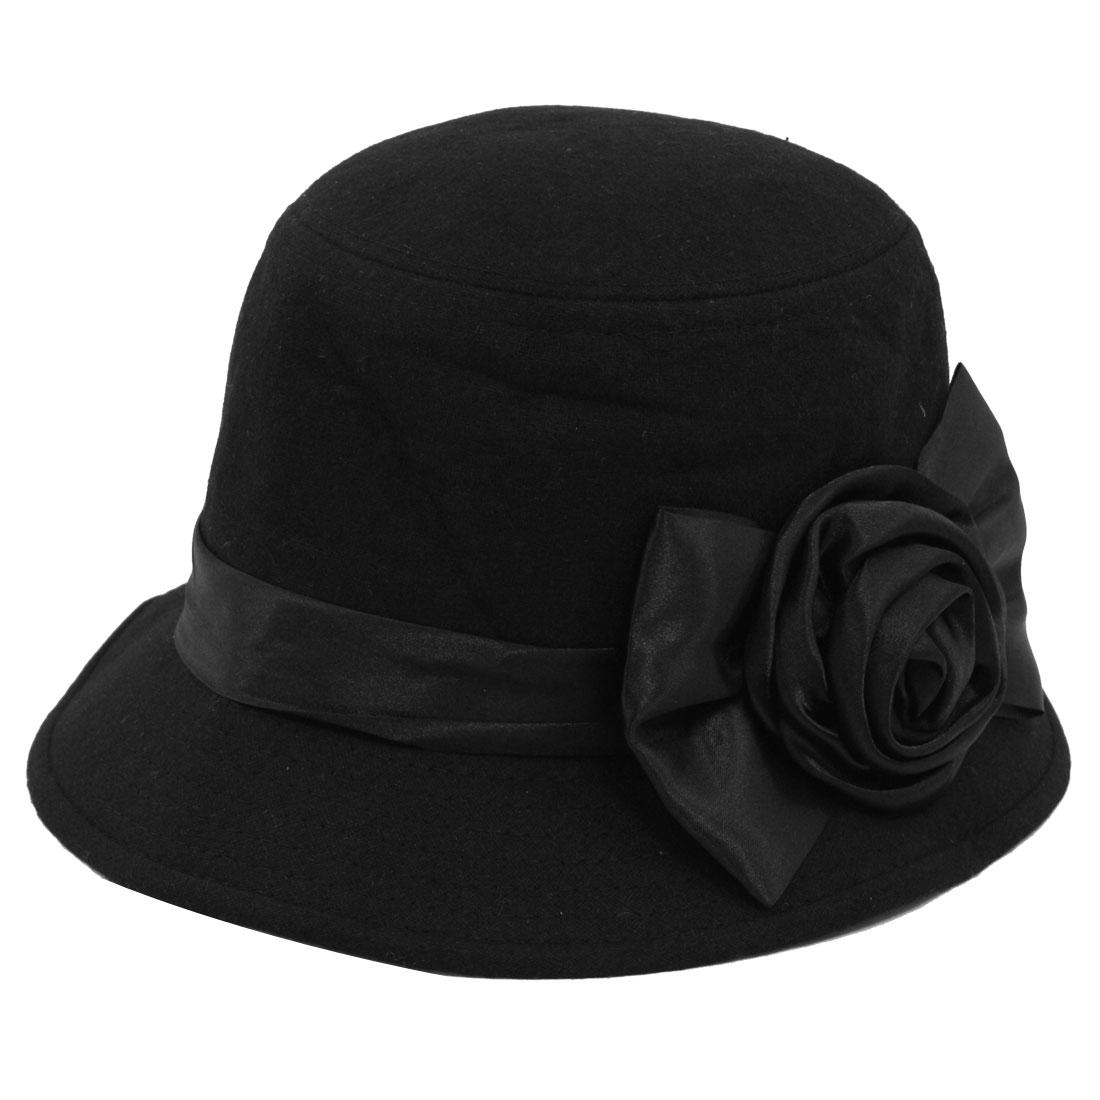 Women Travel Flower Bowtie Ribbon Accent Cloche Bucket Hat Cap Black